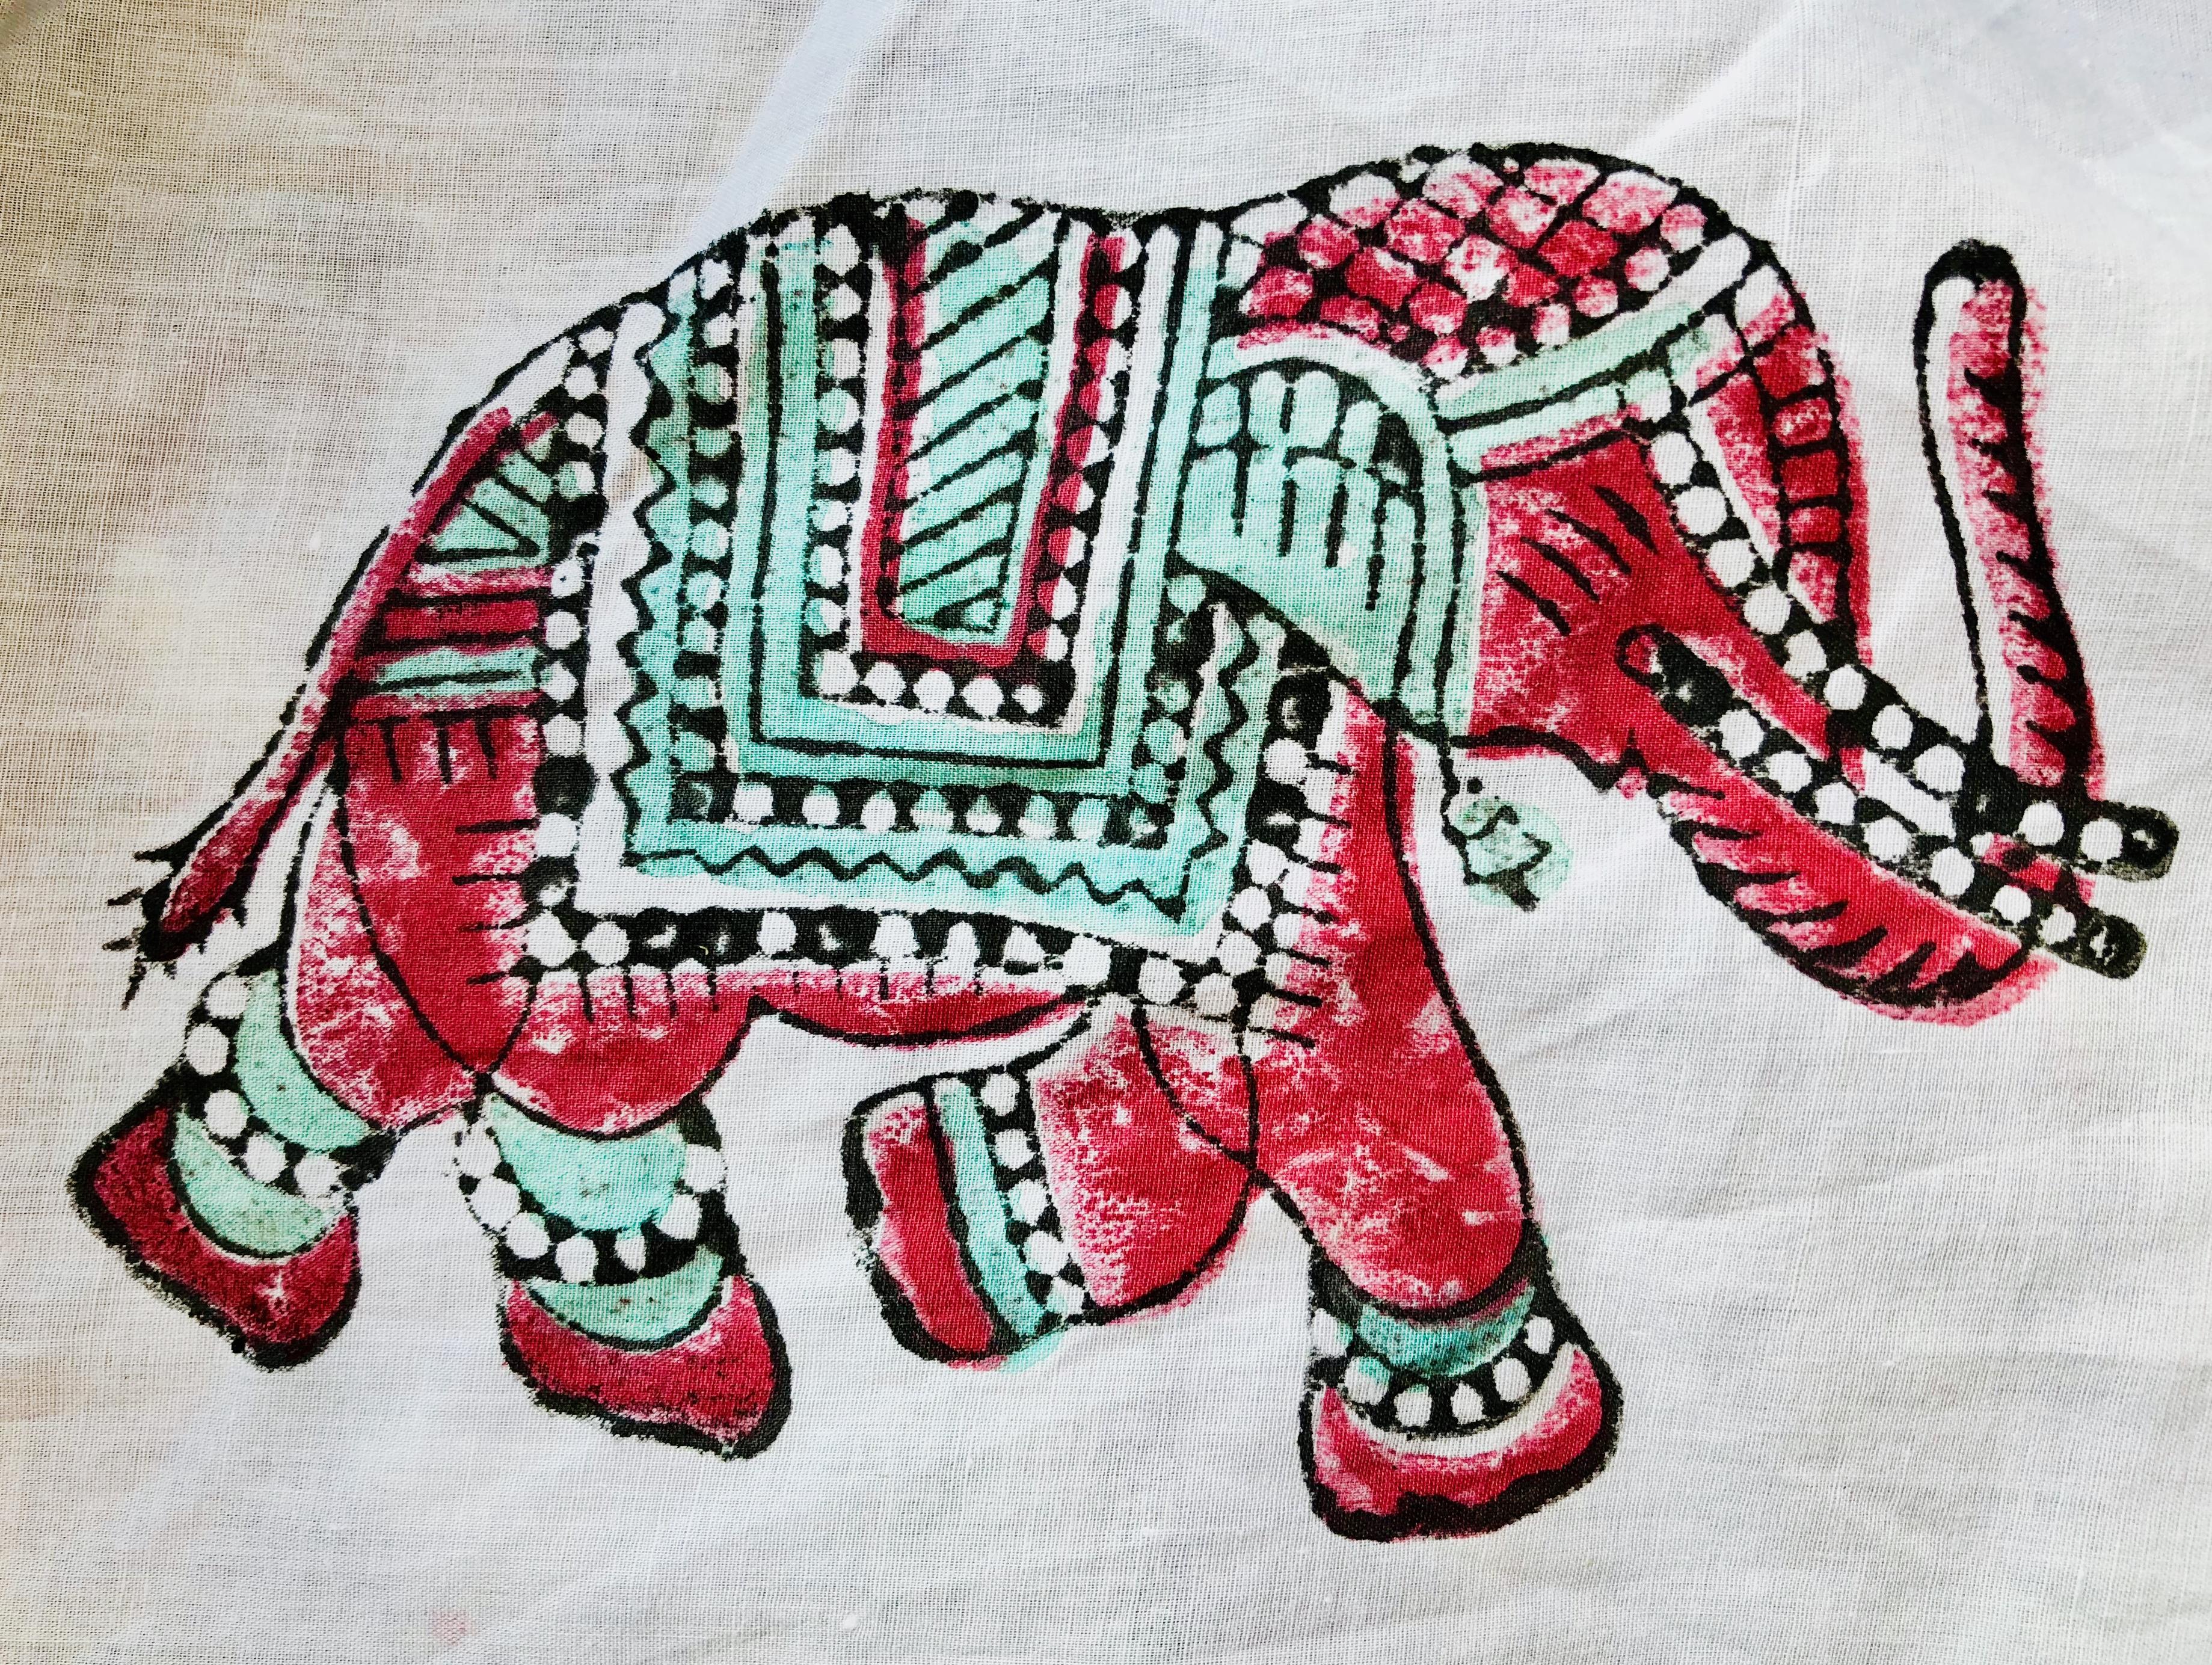 c2e815acfb How to Block Print Fabrics (India, Part 2)@judyschickens